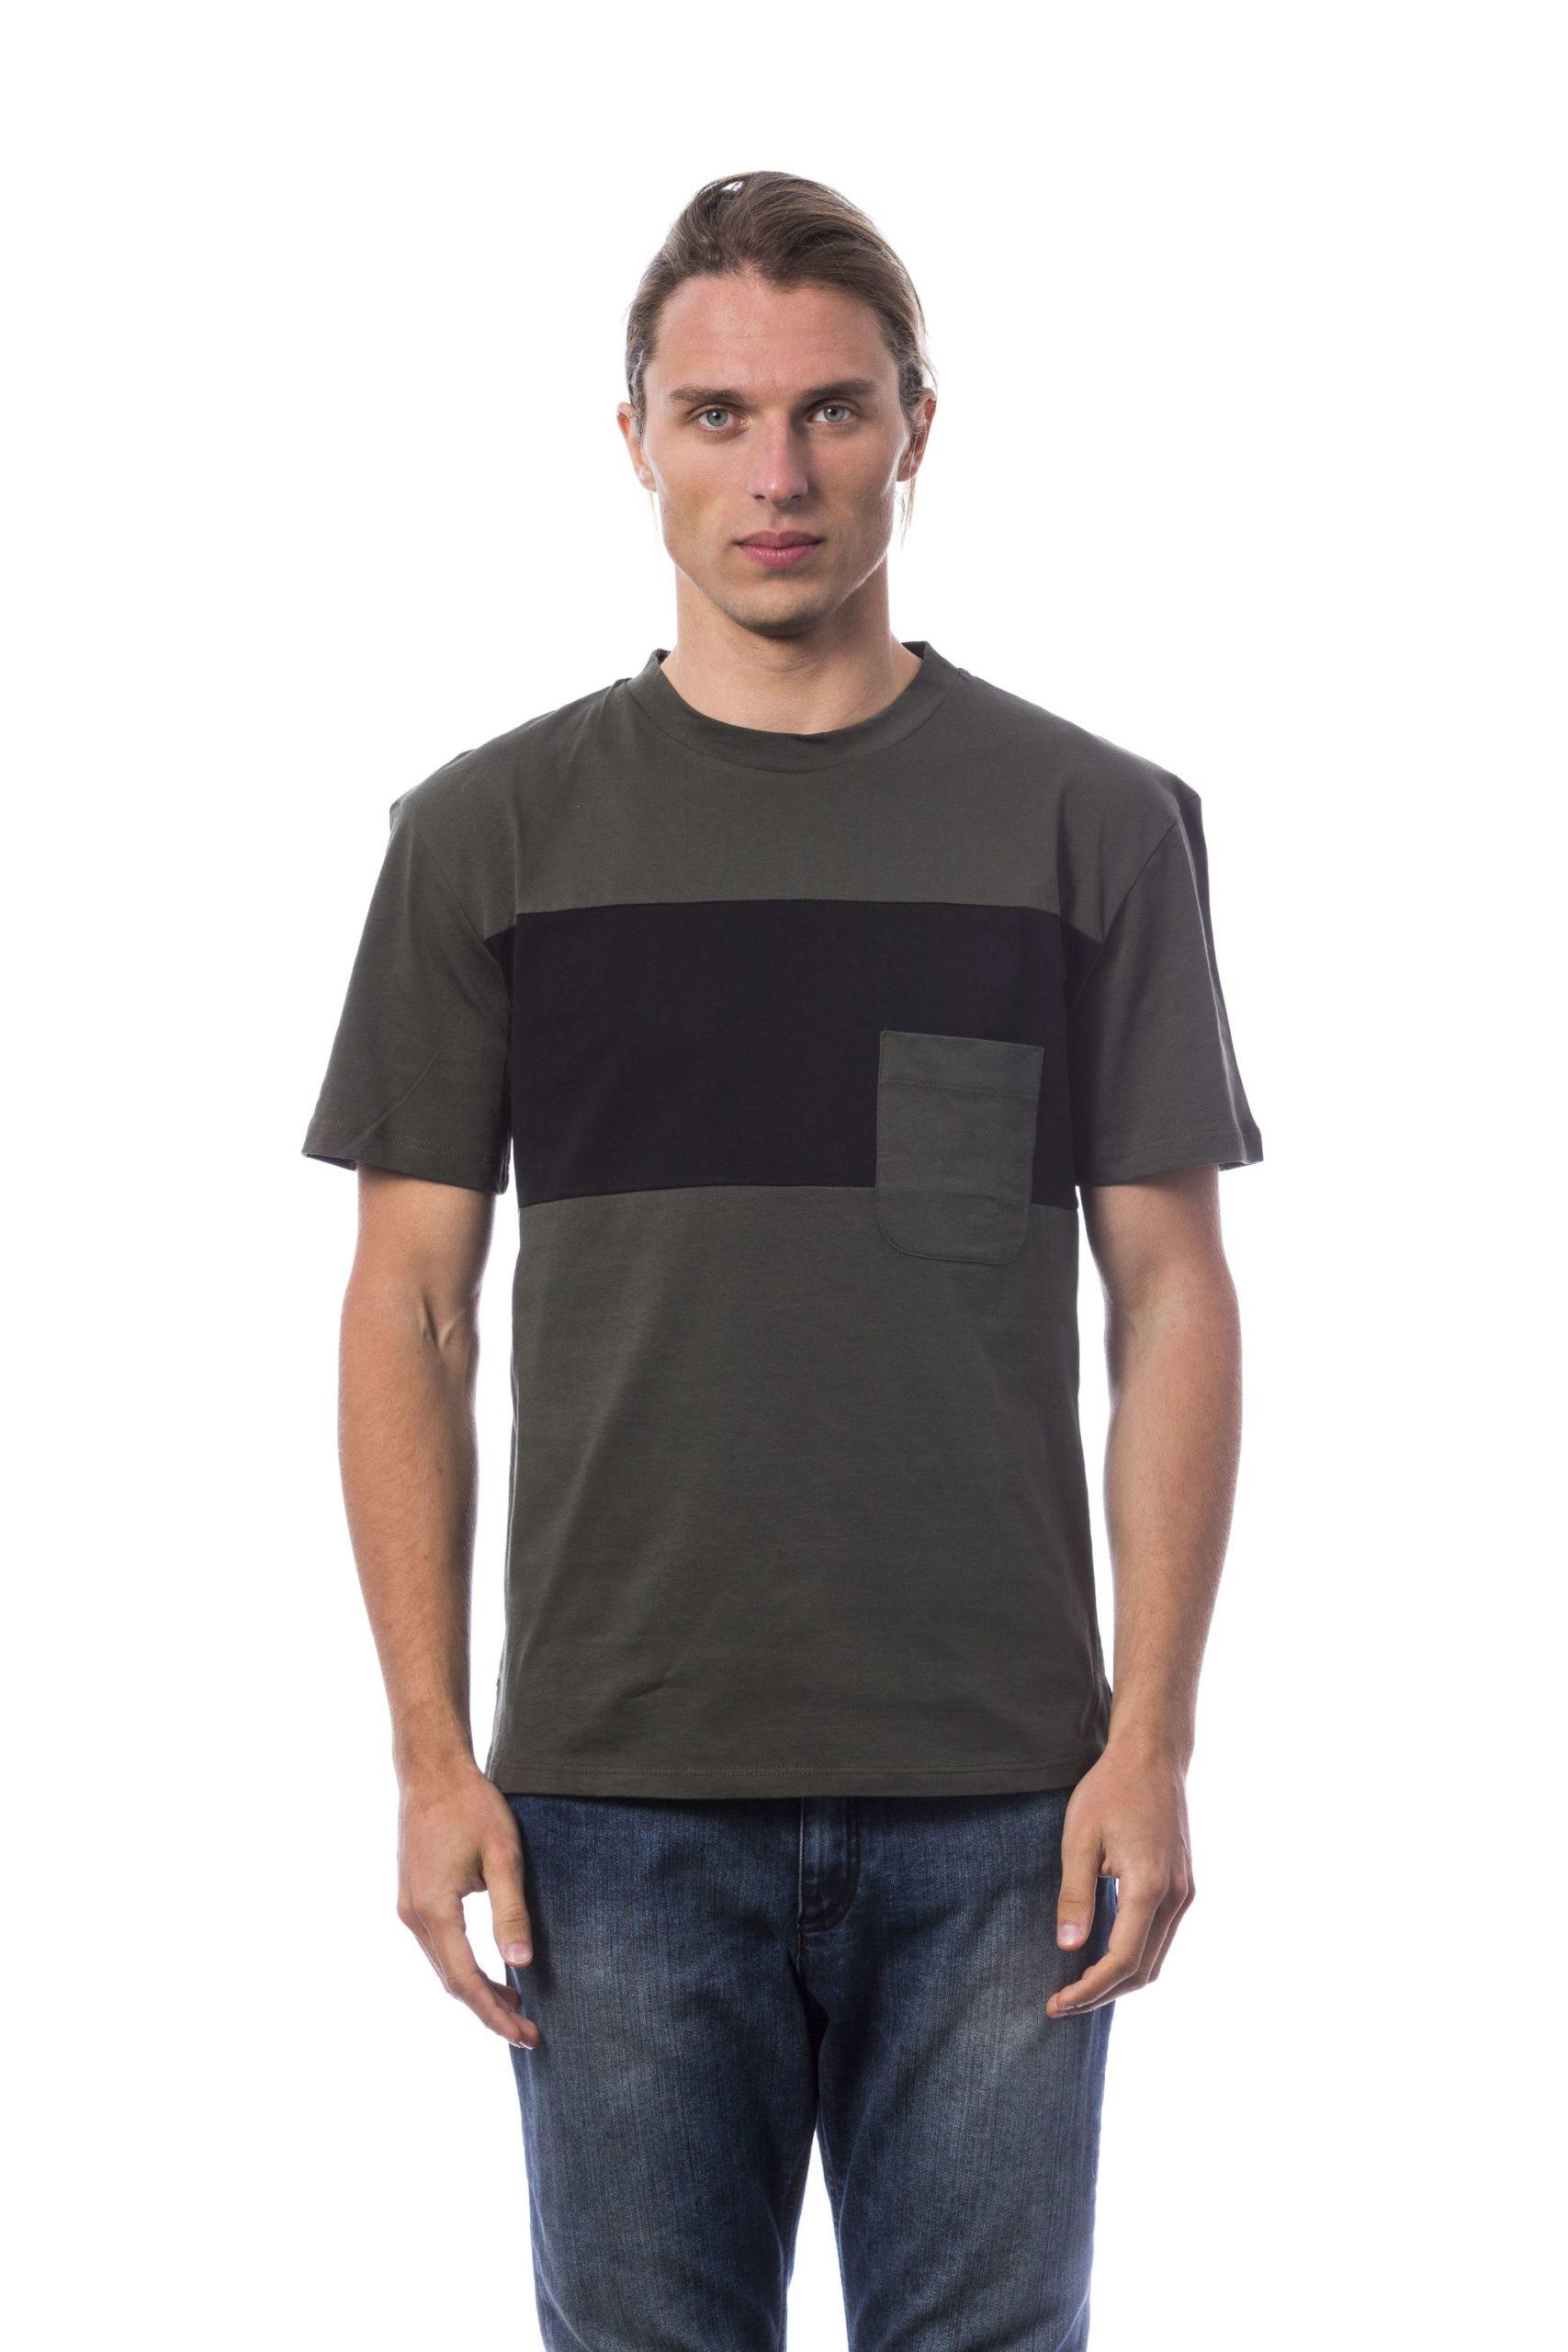 Verri Men's Military T-Shirt Black VE678949 - L